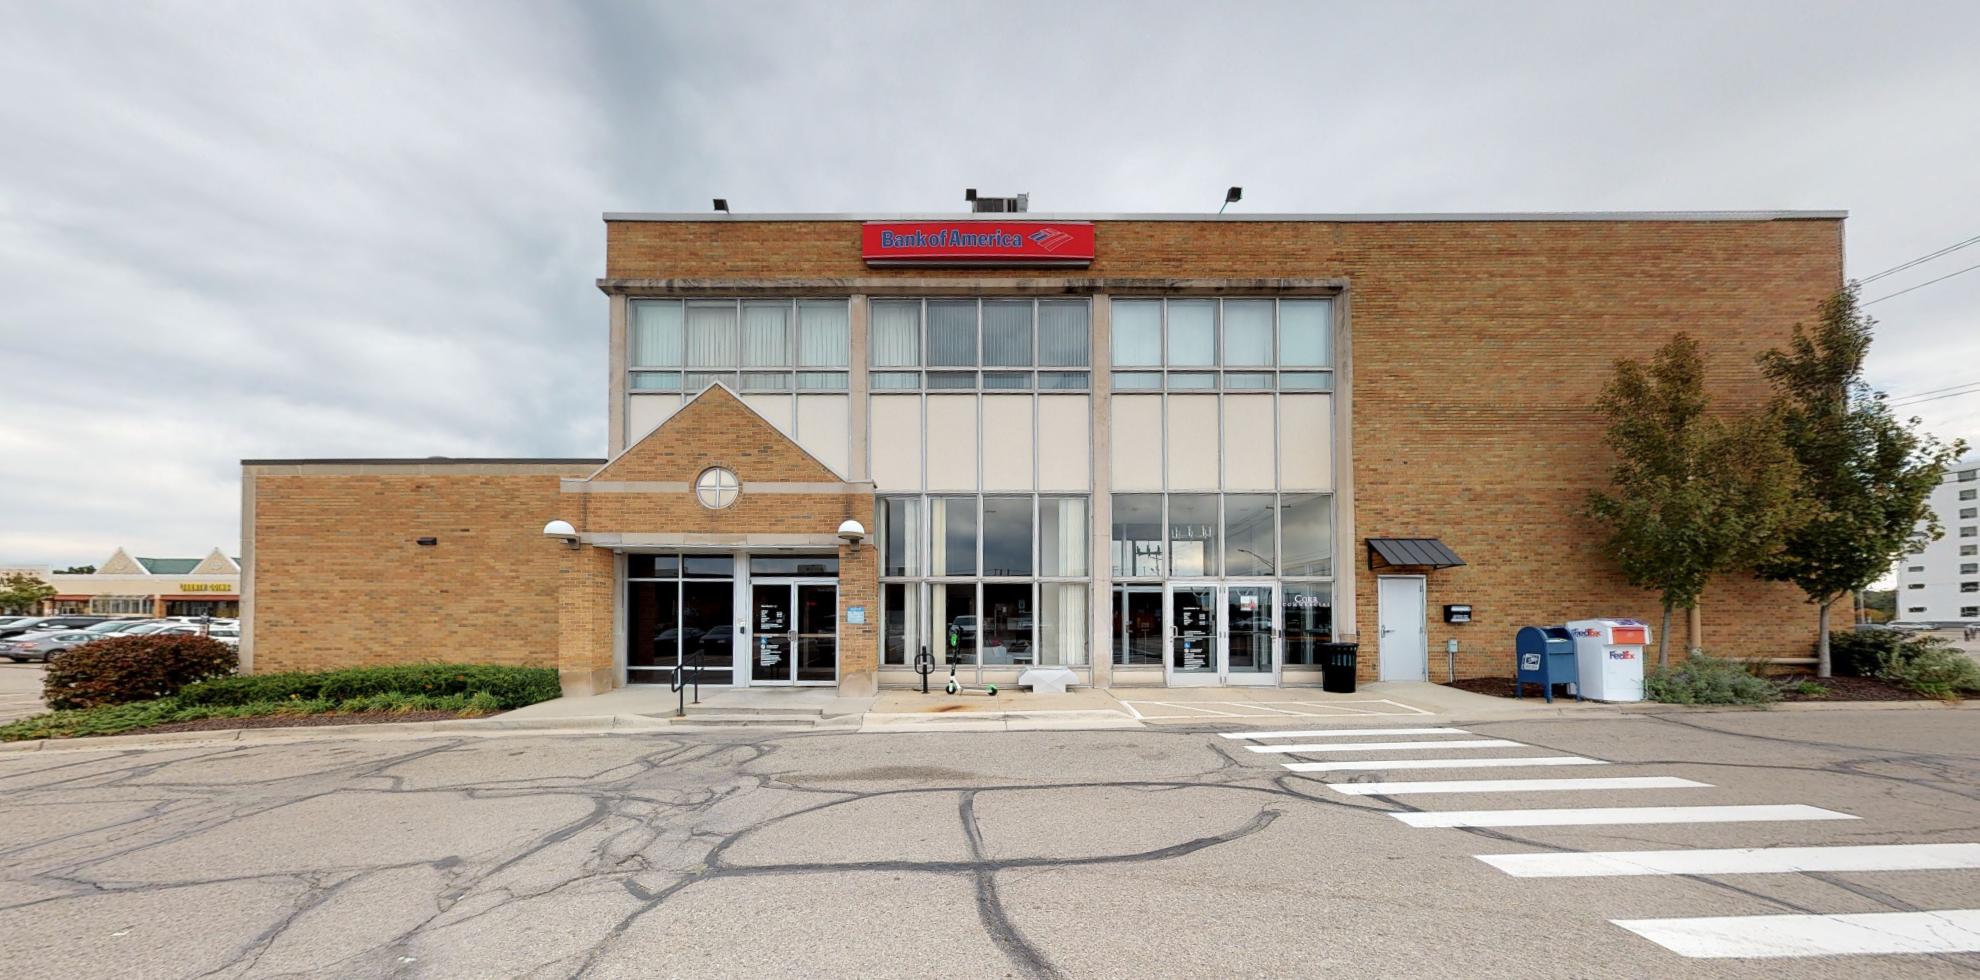 Bank of America financial center with walk-up ATM | 300 Frandor Ave, Lansing, MI 48912